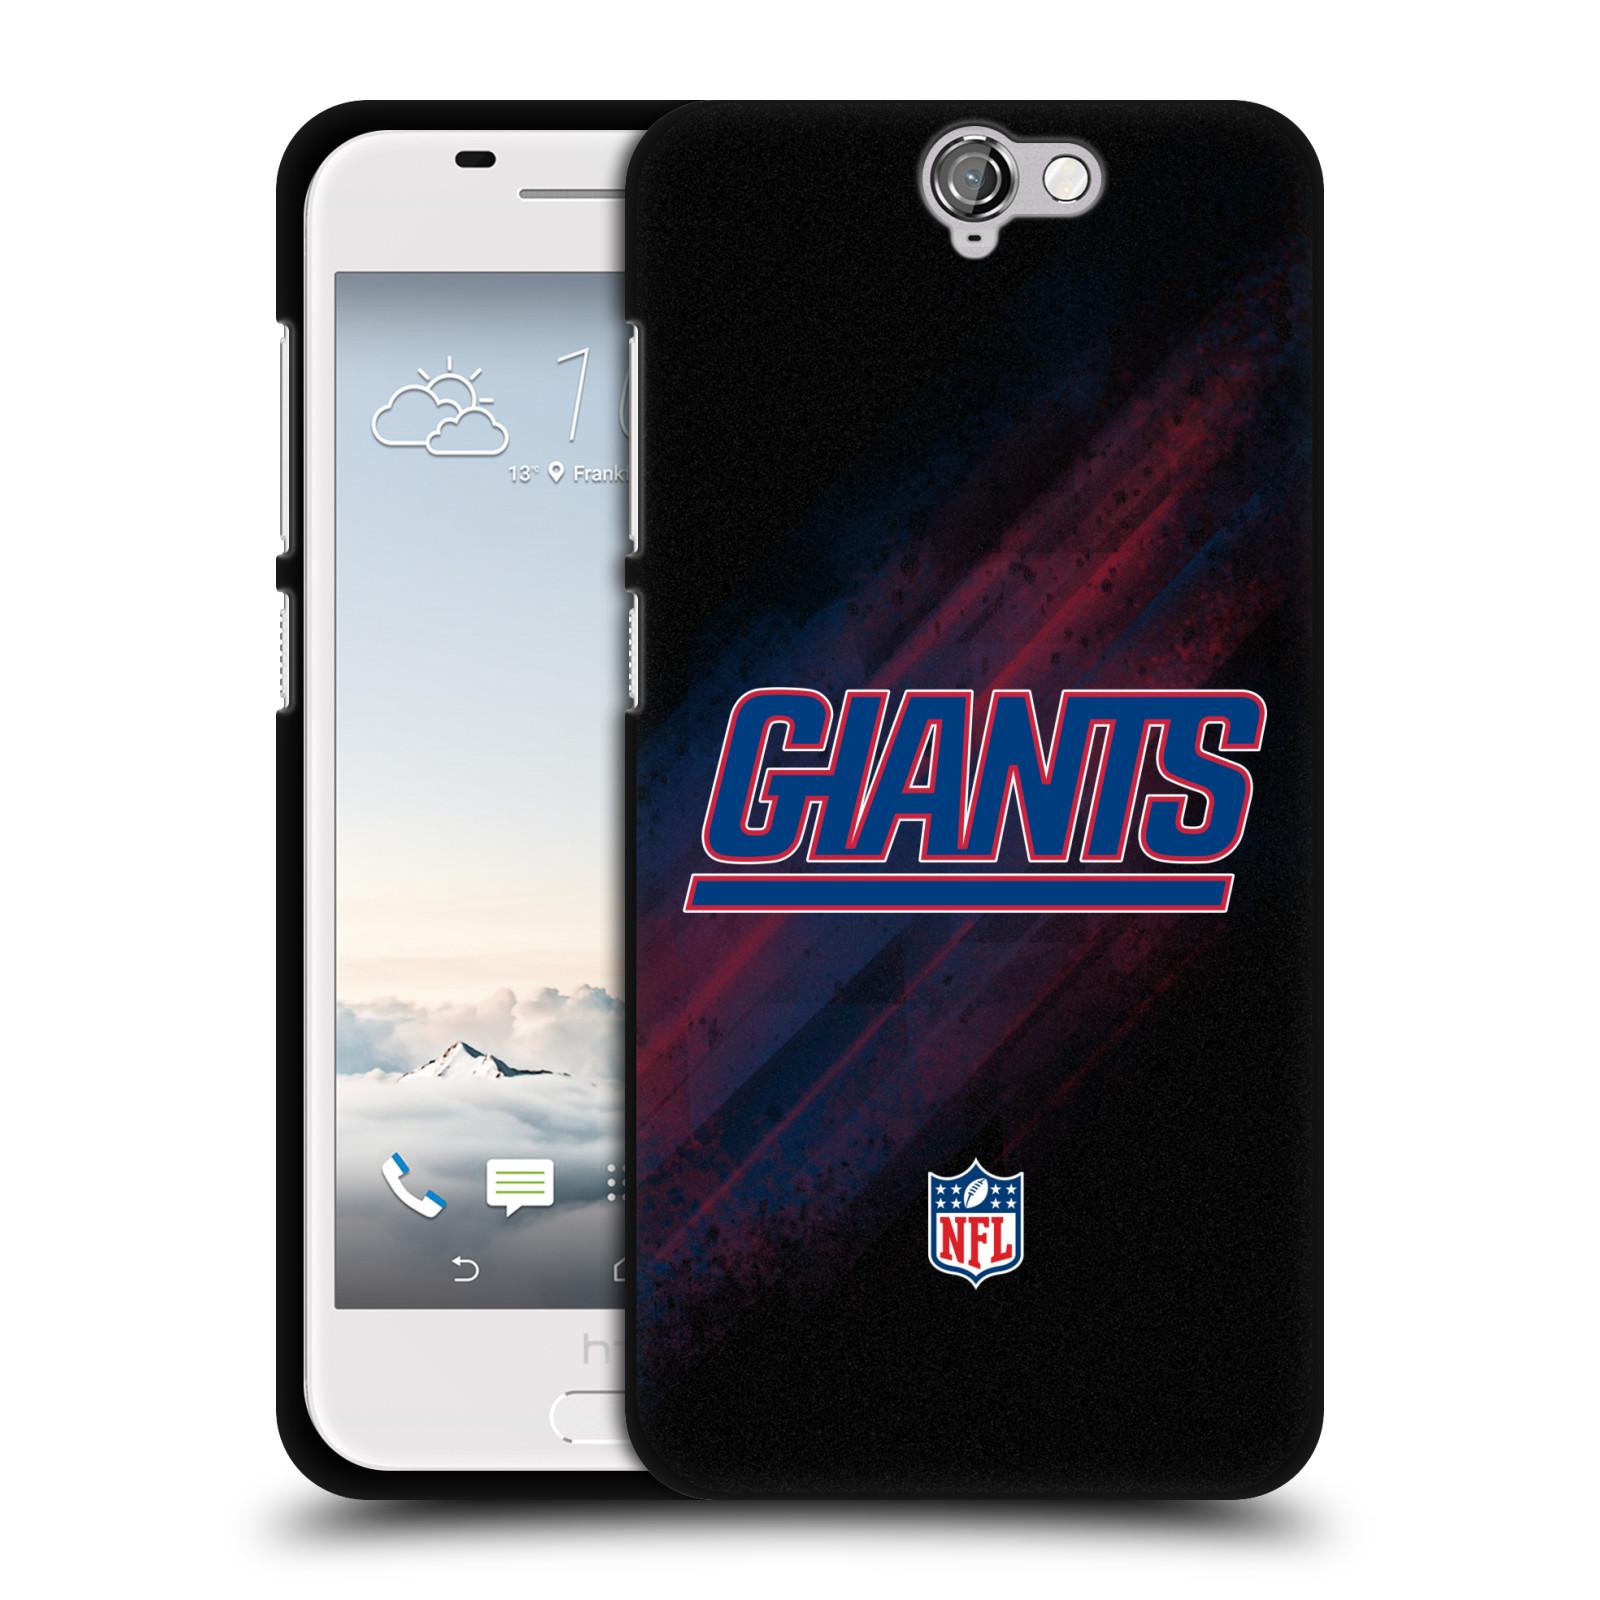 OFFICIAL-NFL-NEW-YORK-GIANTS-LOGO-BLACK-SOFT-GEL-CASE-FOR-HTC-PHONES